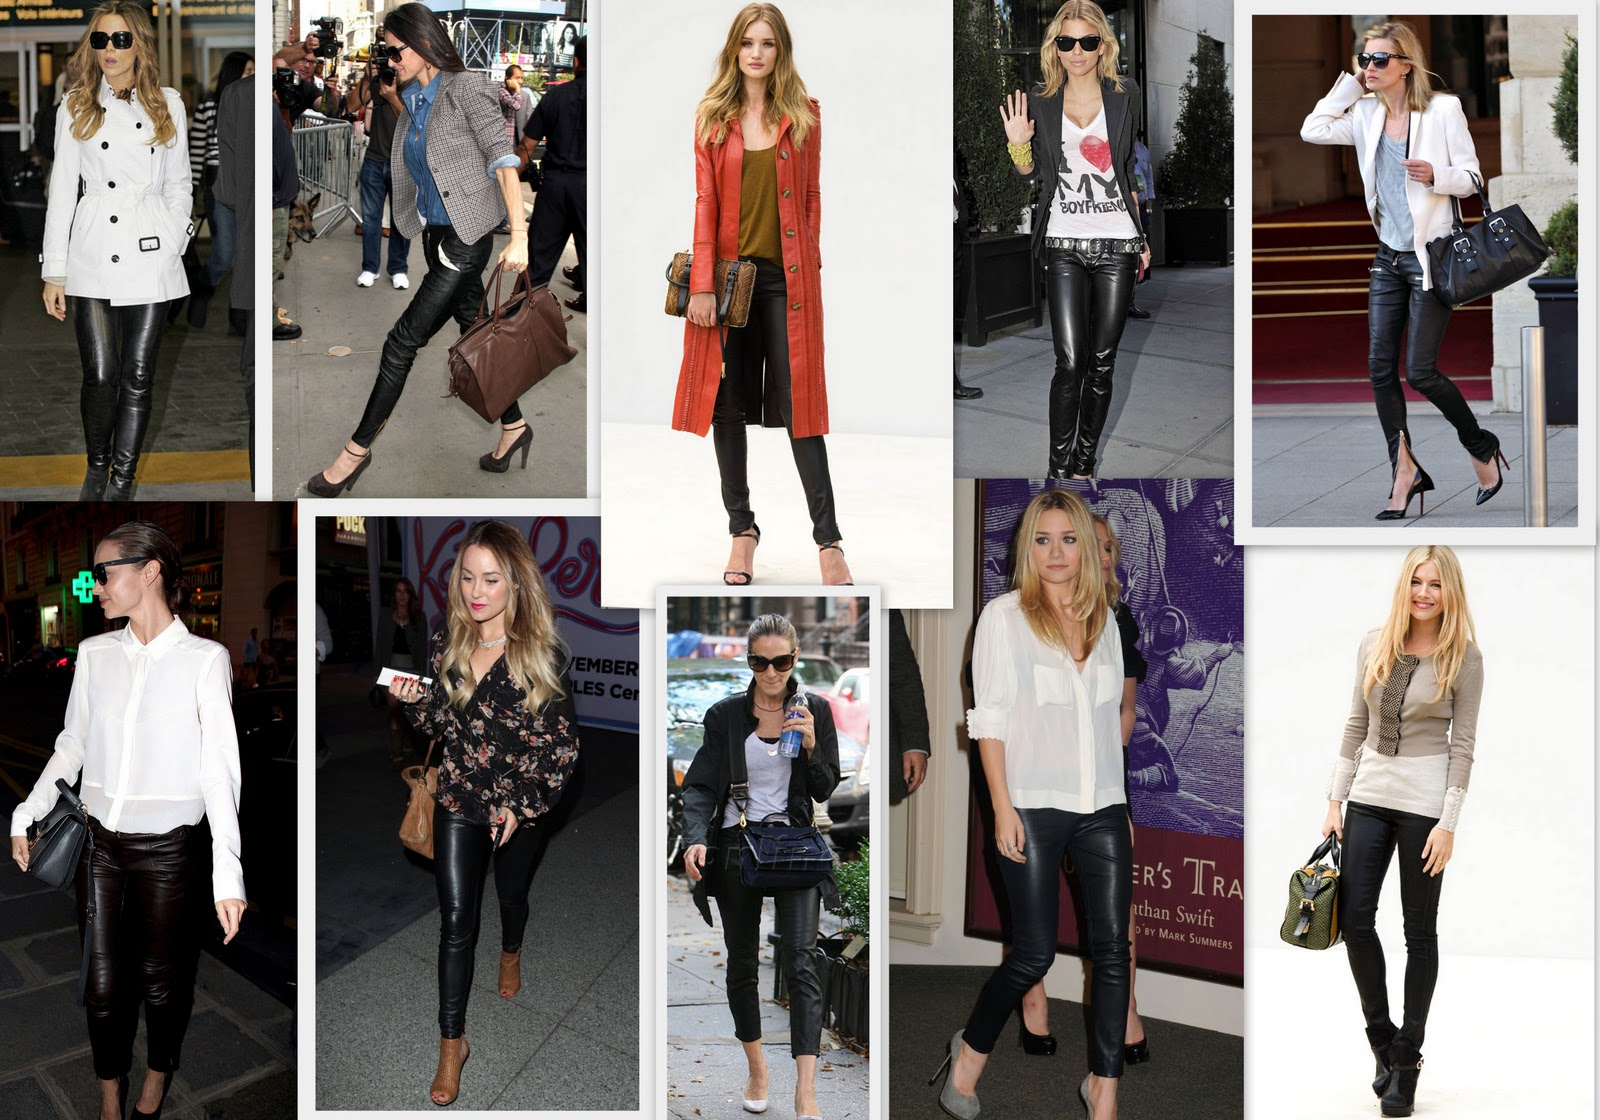 http://1.bp.blogspot.com/-ZUaozortla8/Tp2dt1TW6aI/AAAAAAAADfM/i-UF_JEUYZI/s1600/Leather+Pants.jpg